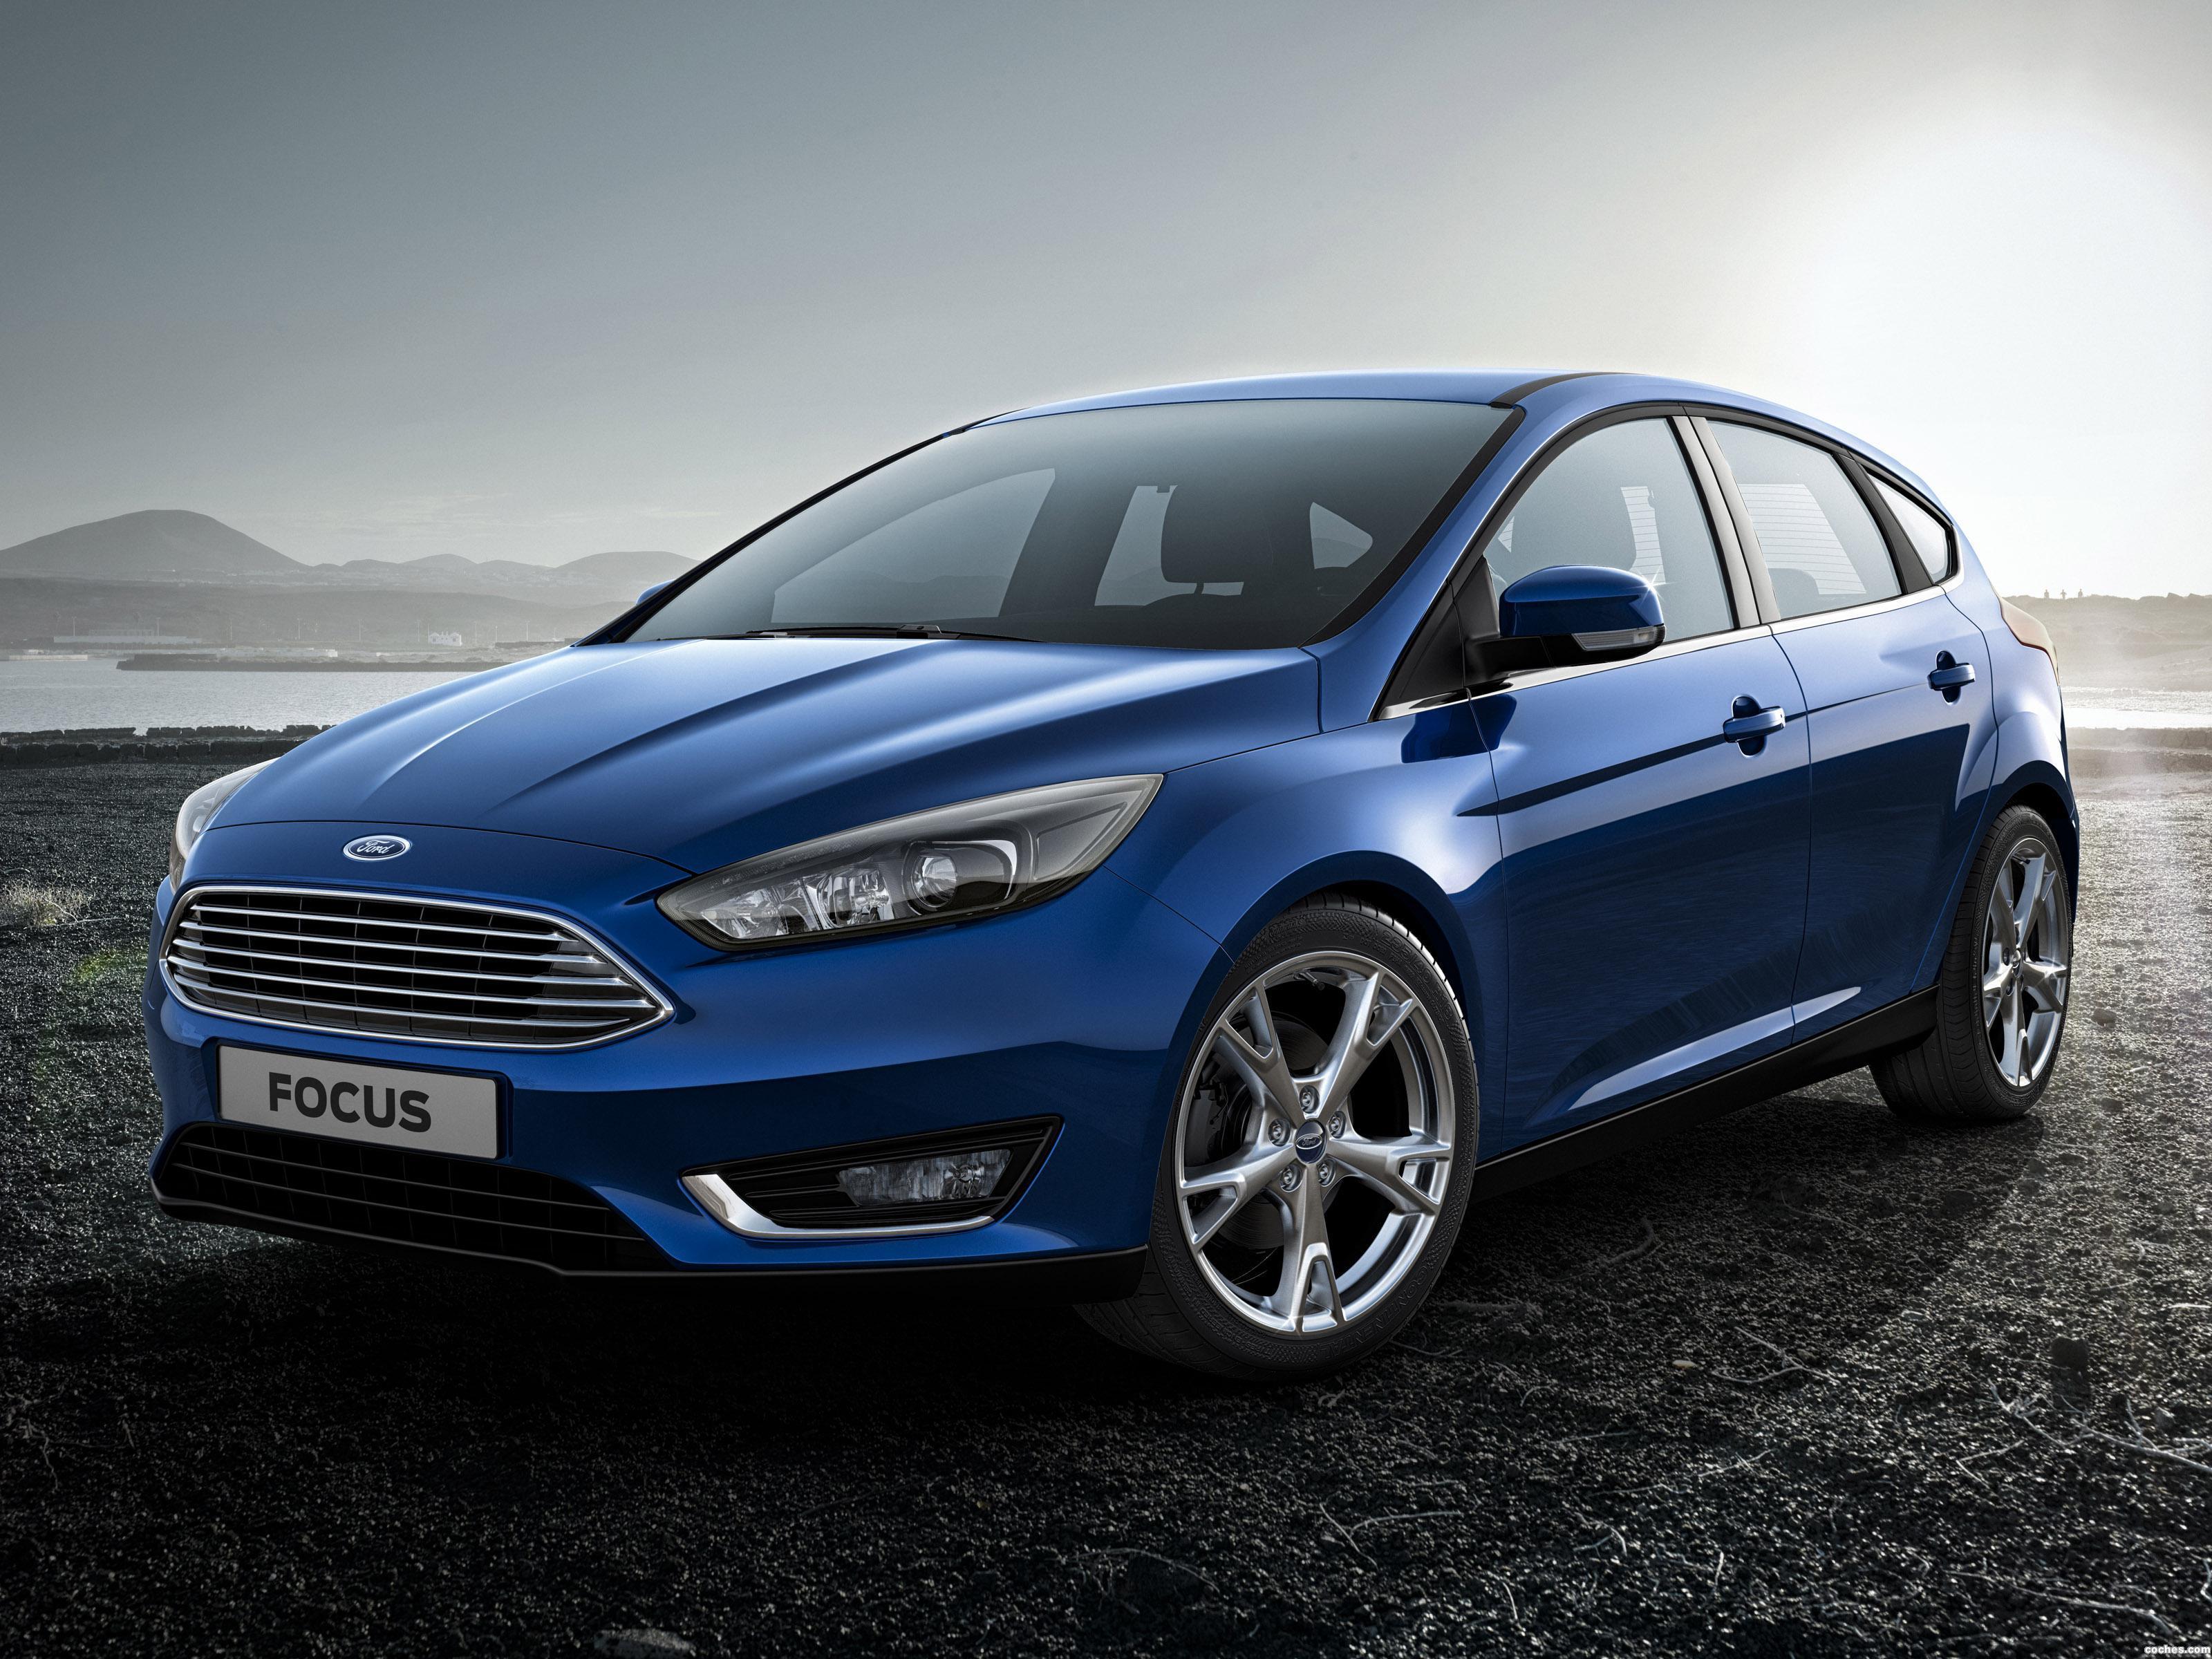 Foto 0 de Ford Focus 2014